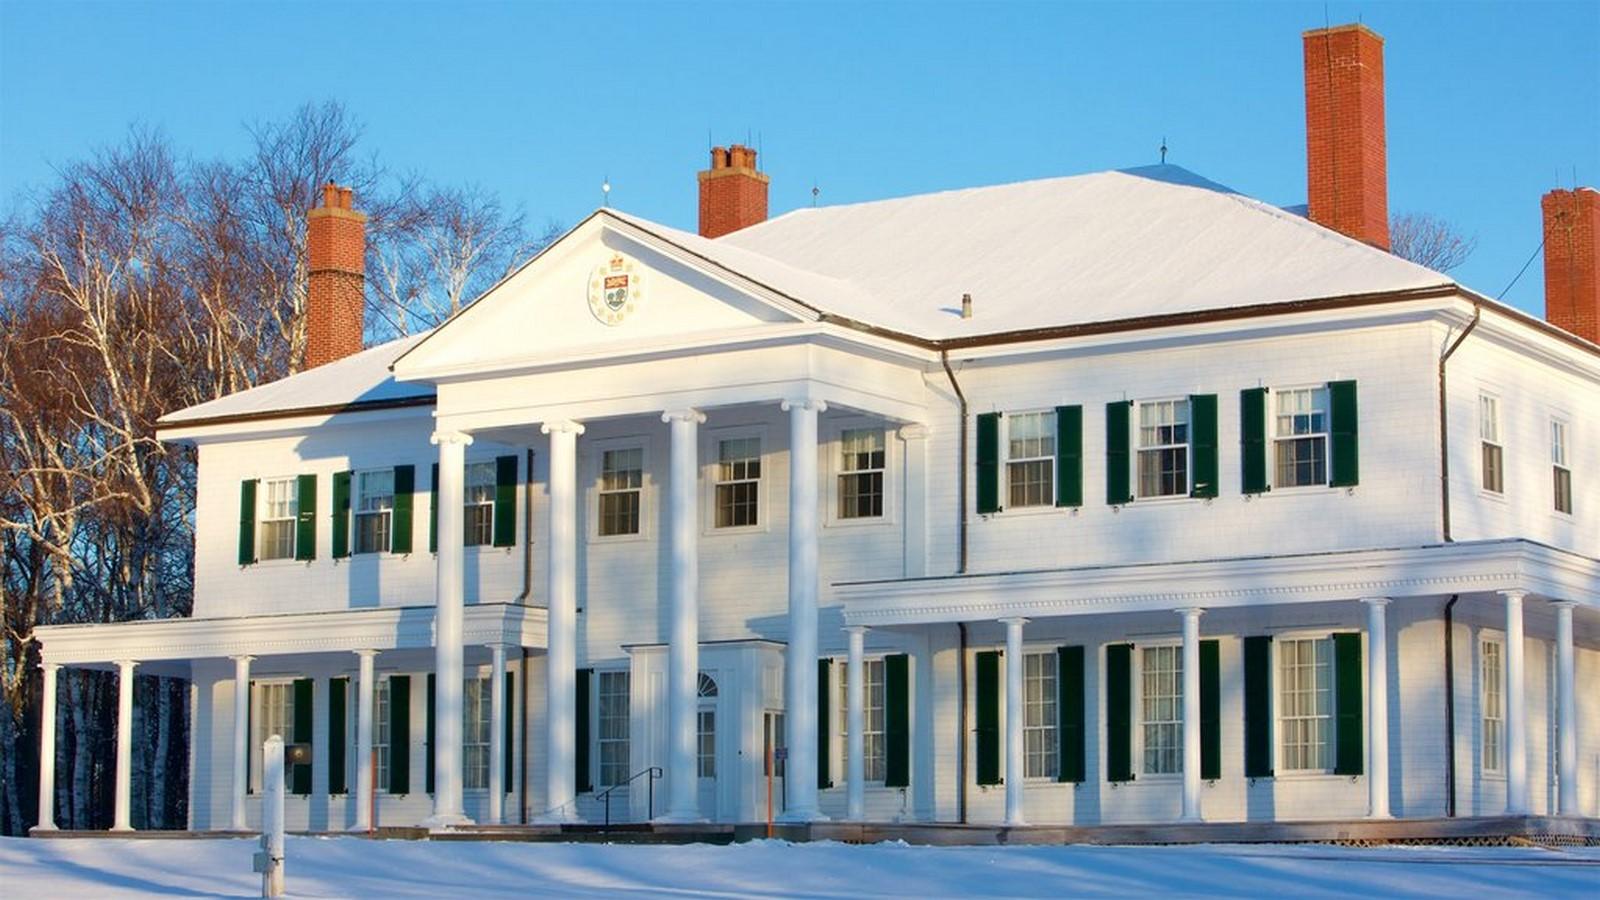 Government house of Prince Edward Island, Charlottetown, Canada -Sheet1